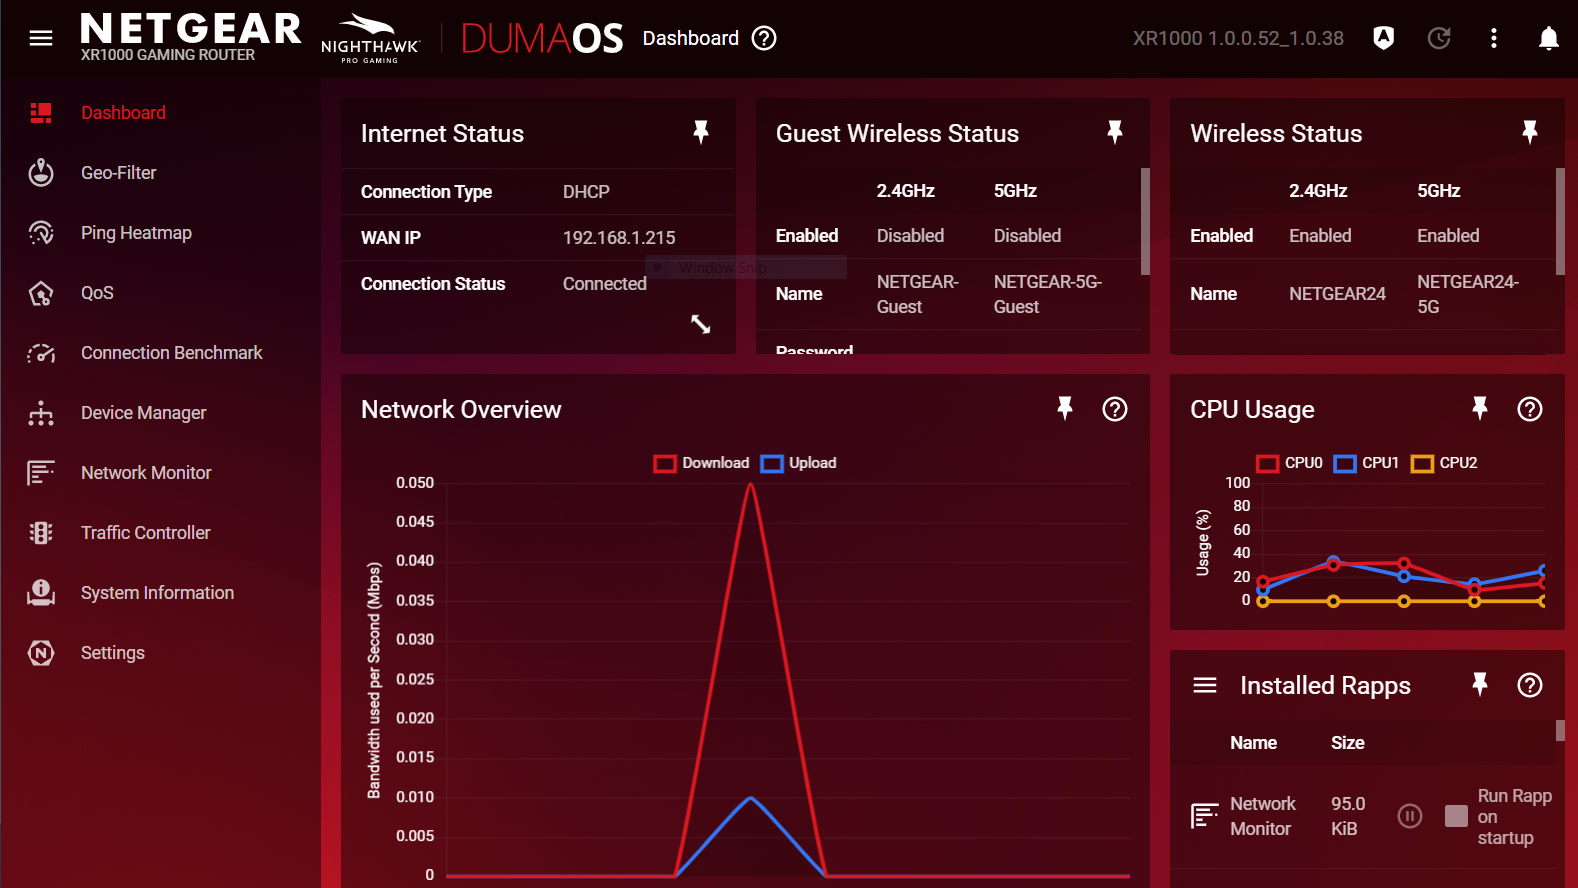 Netgear Nighthawk XR1000 review